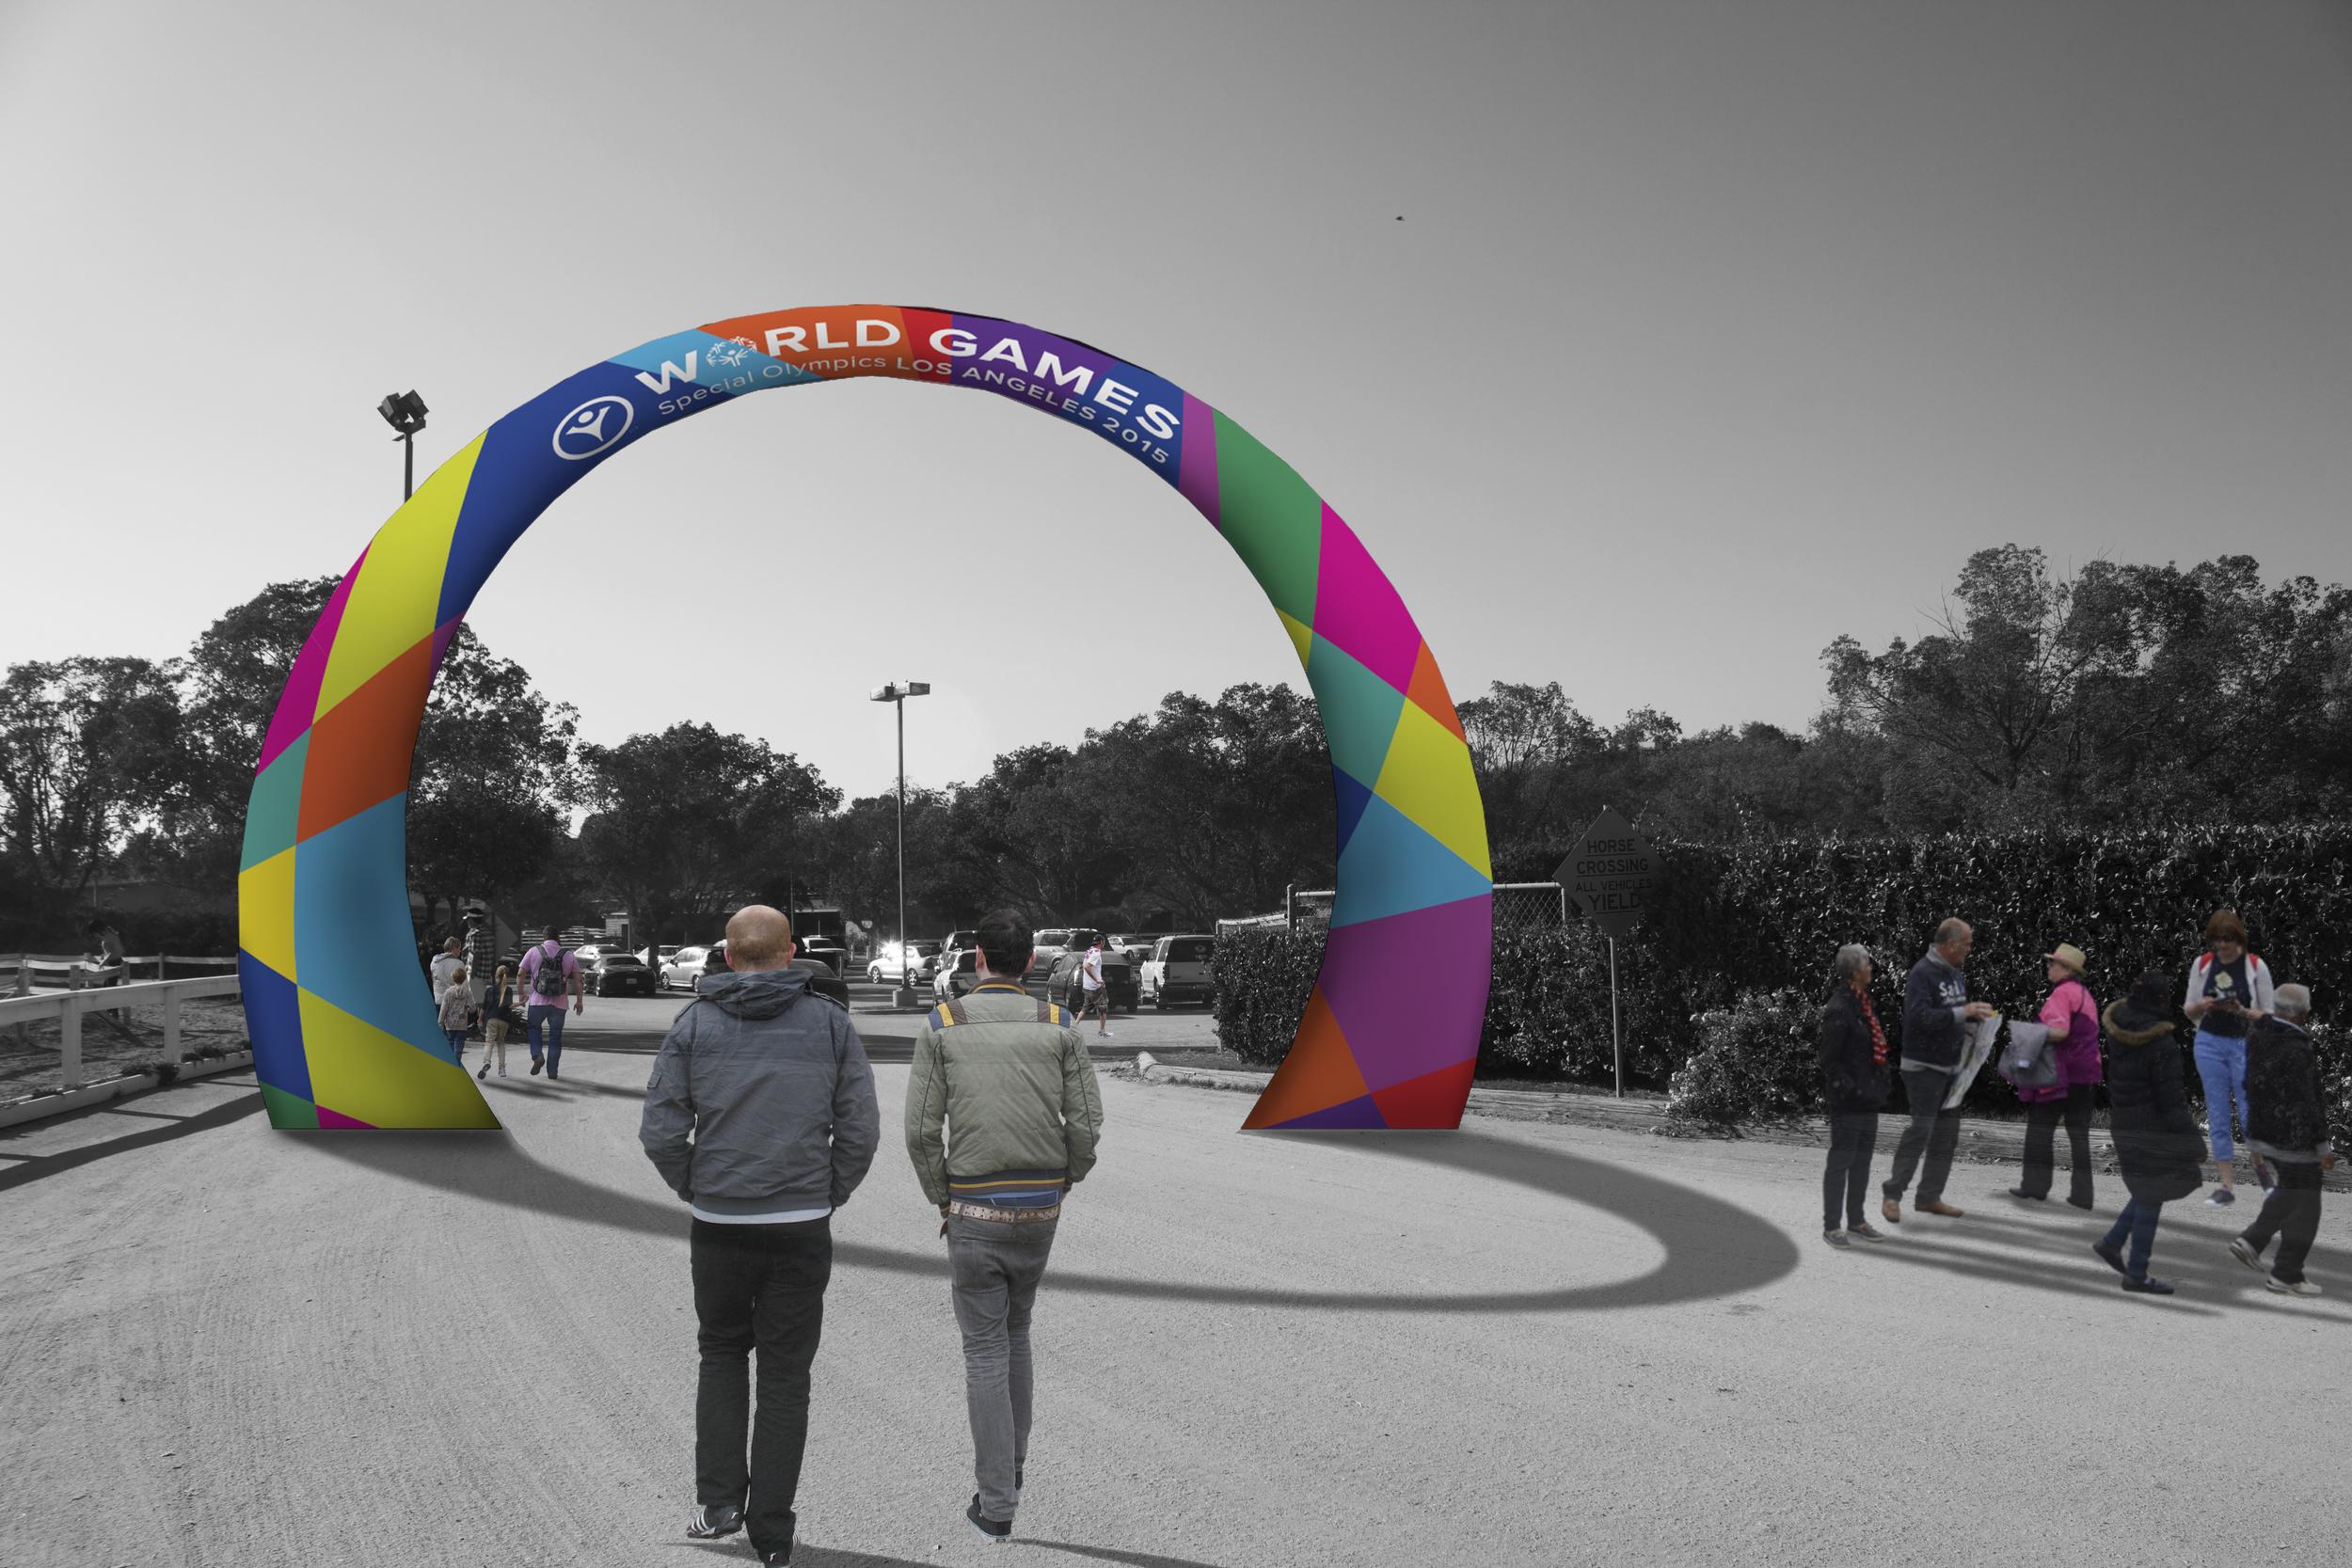 Arch Large.jpg